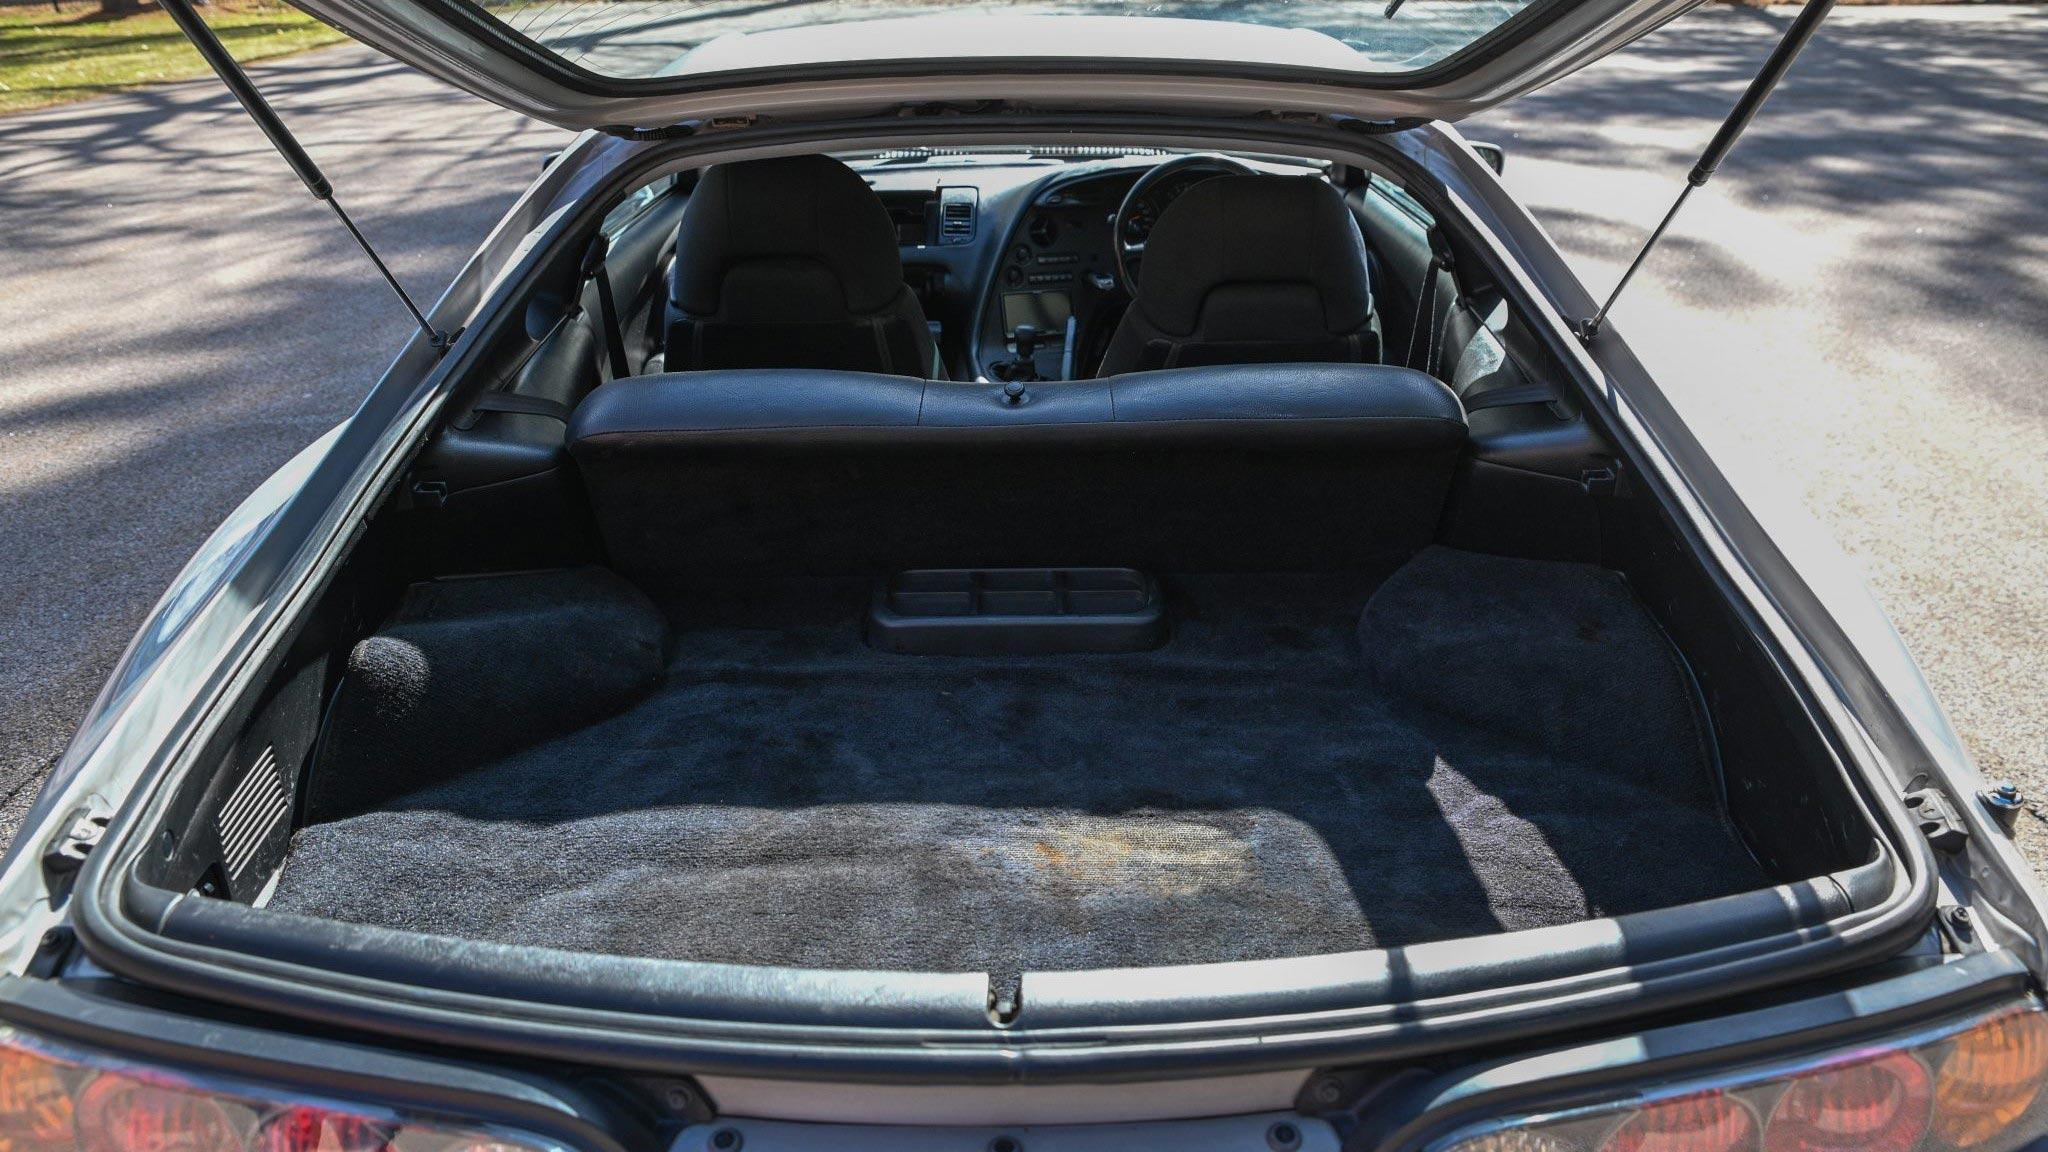 The Toyota RZ Trunk